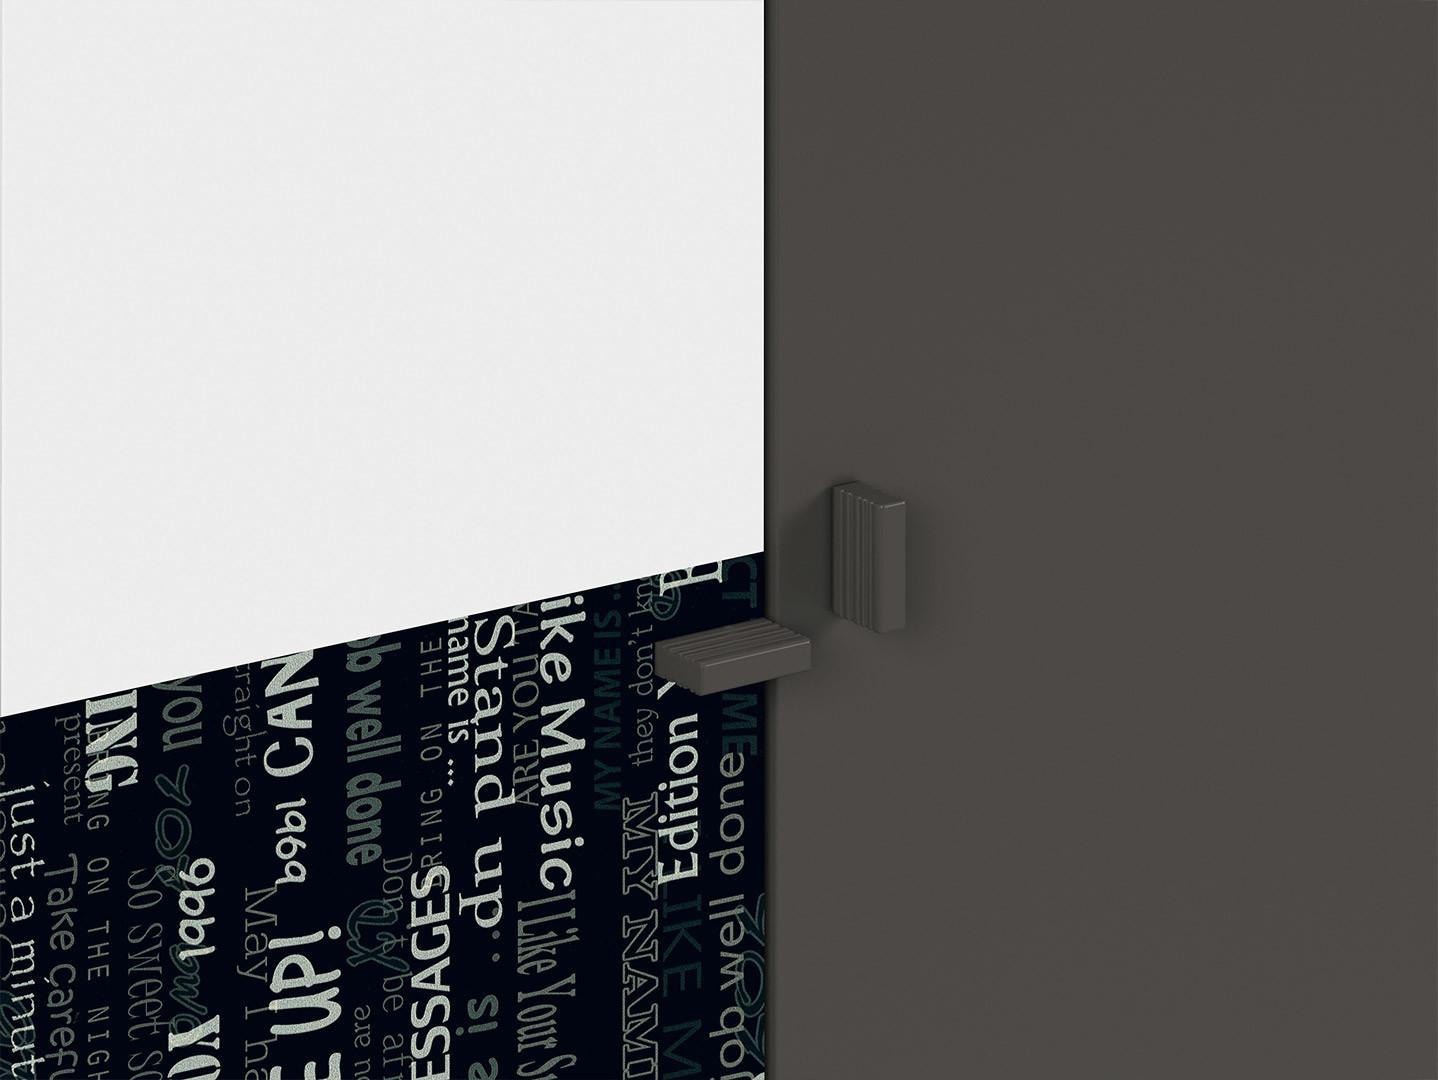 Skriňa GRAPHIC REG2D/C sivý wolfram/sivý wolfram/biely/čierny s nádpismi